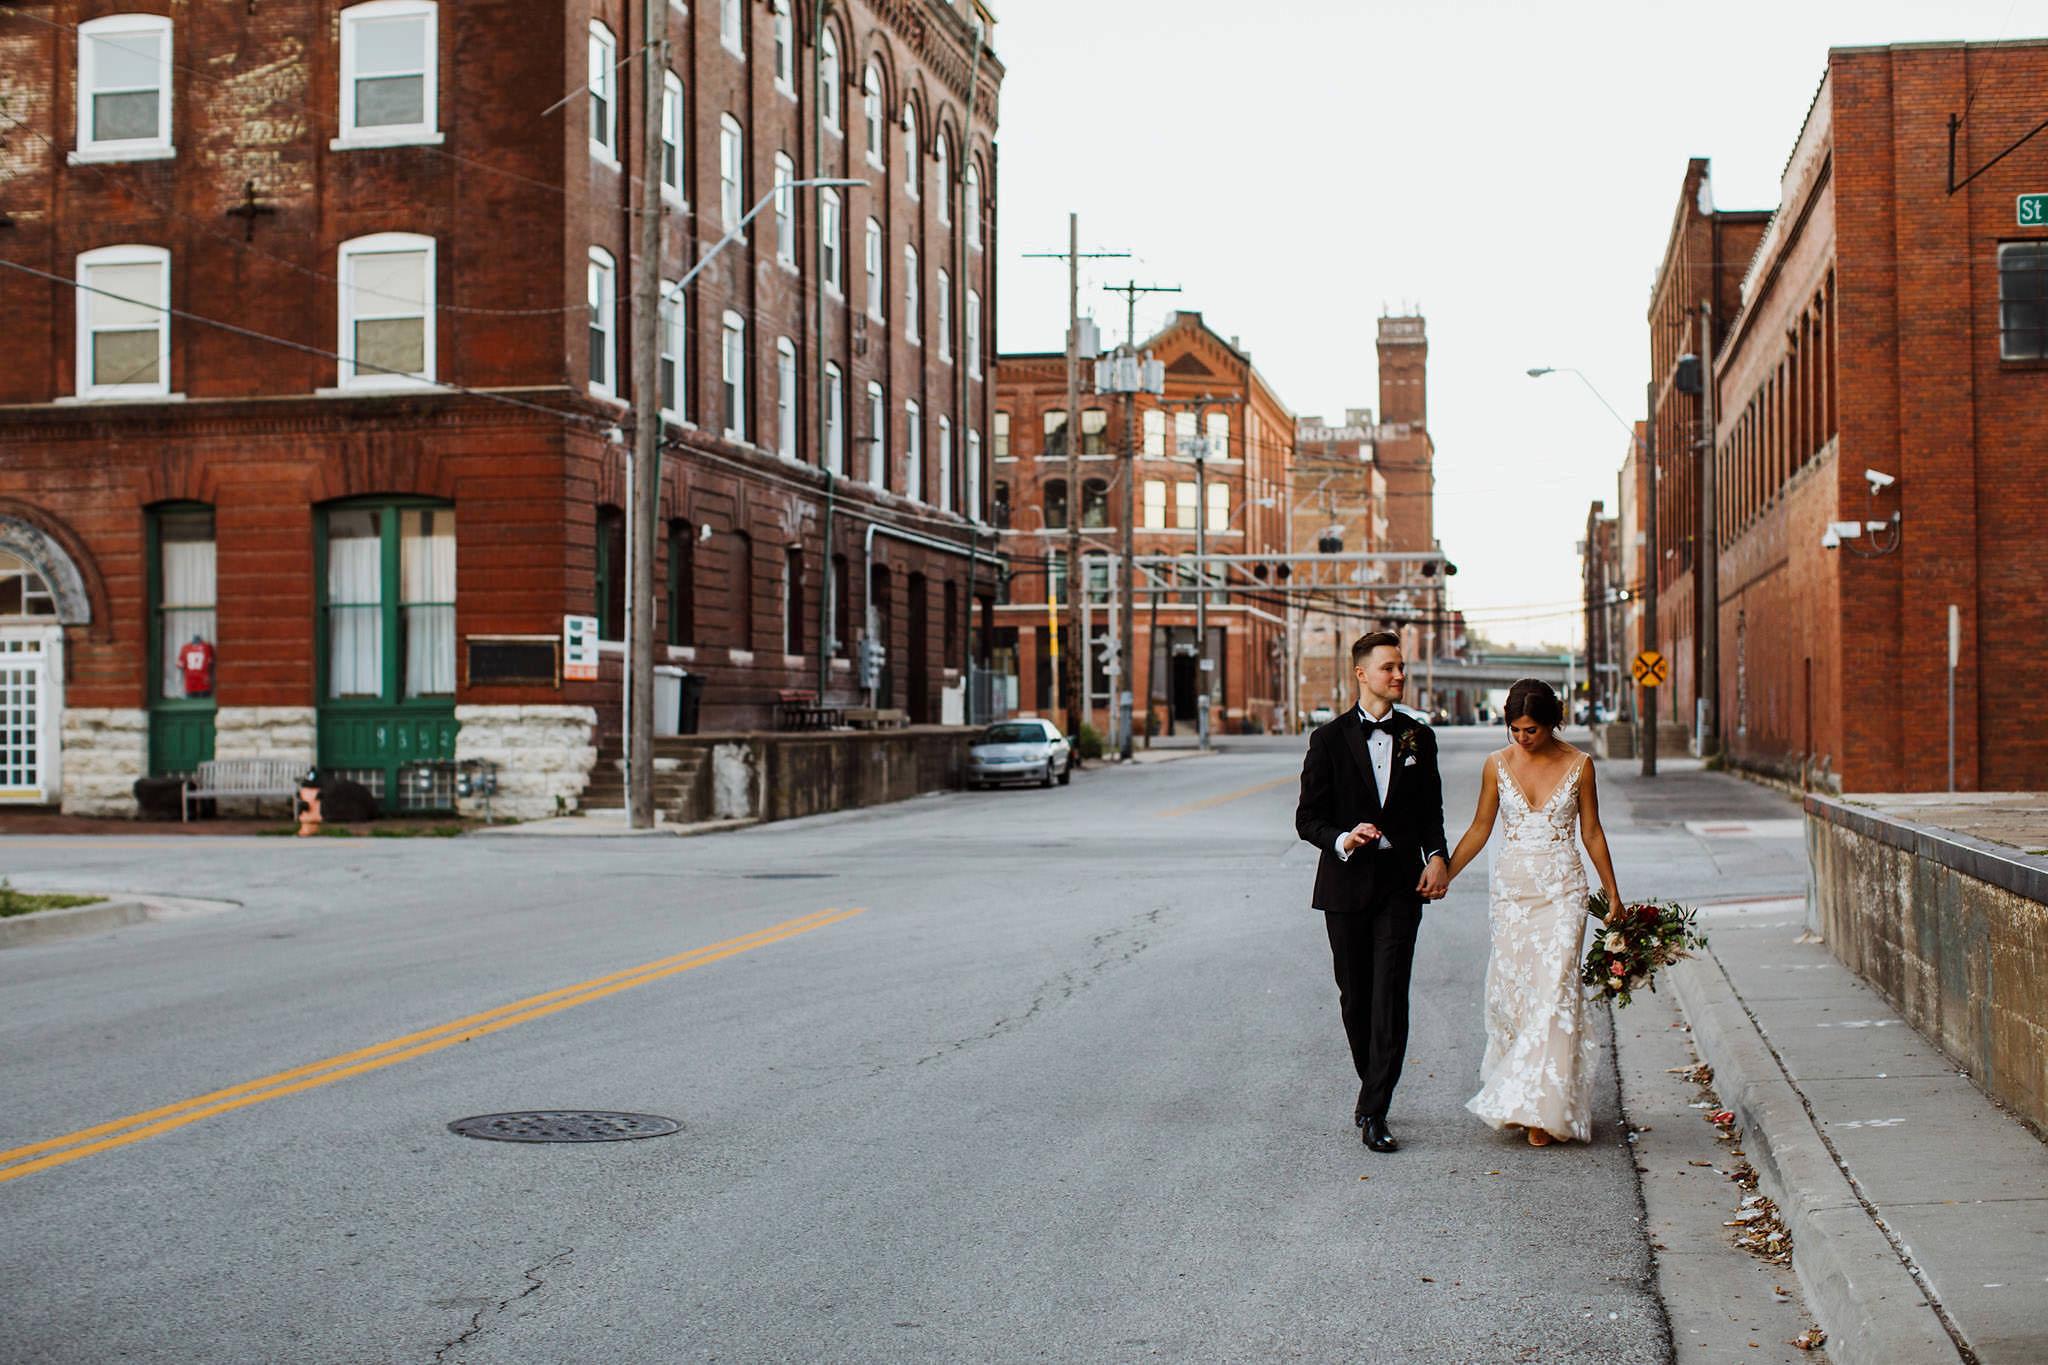 Feast of Fancy-Hobbs Building Wedding_Cinder Block Brewery Wedding_Kindling Wedding Photography_09.JPG